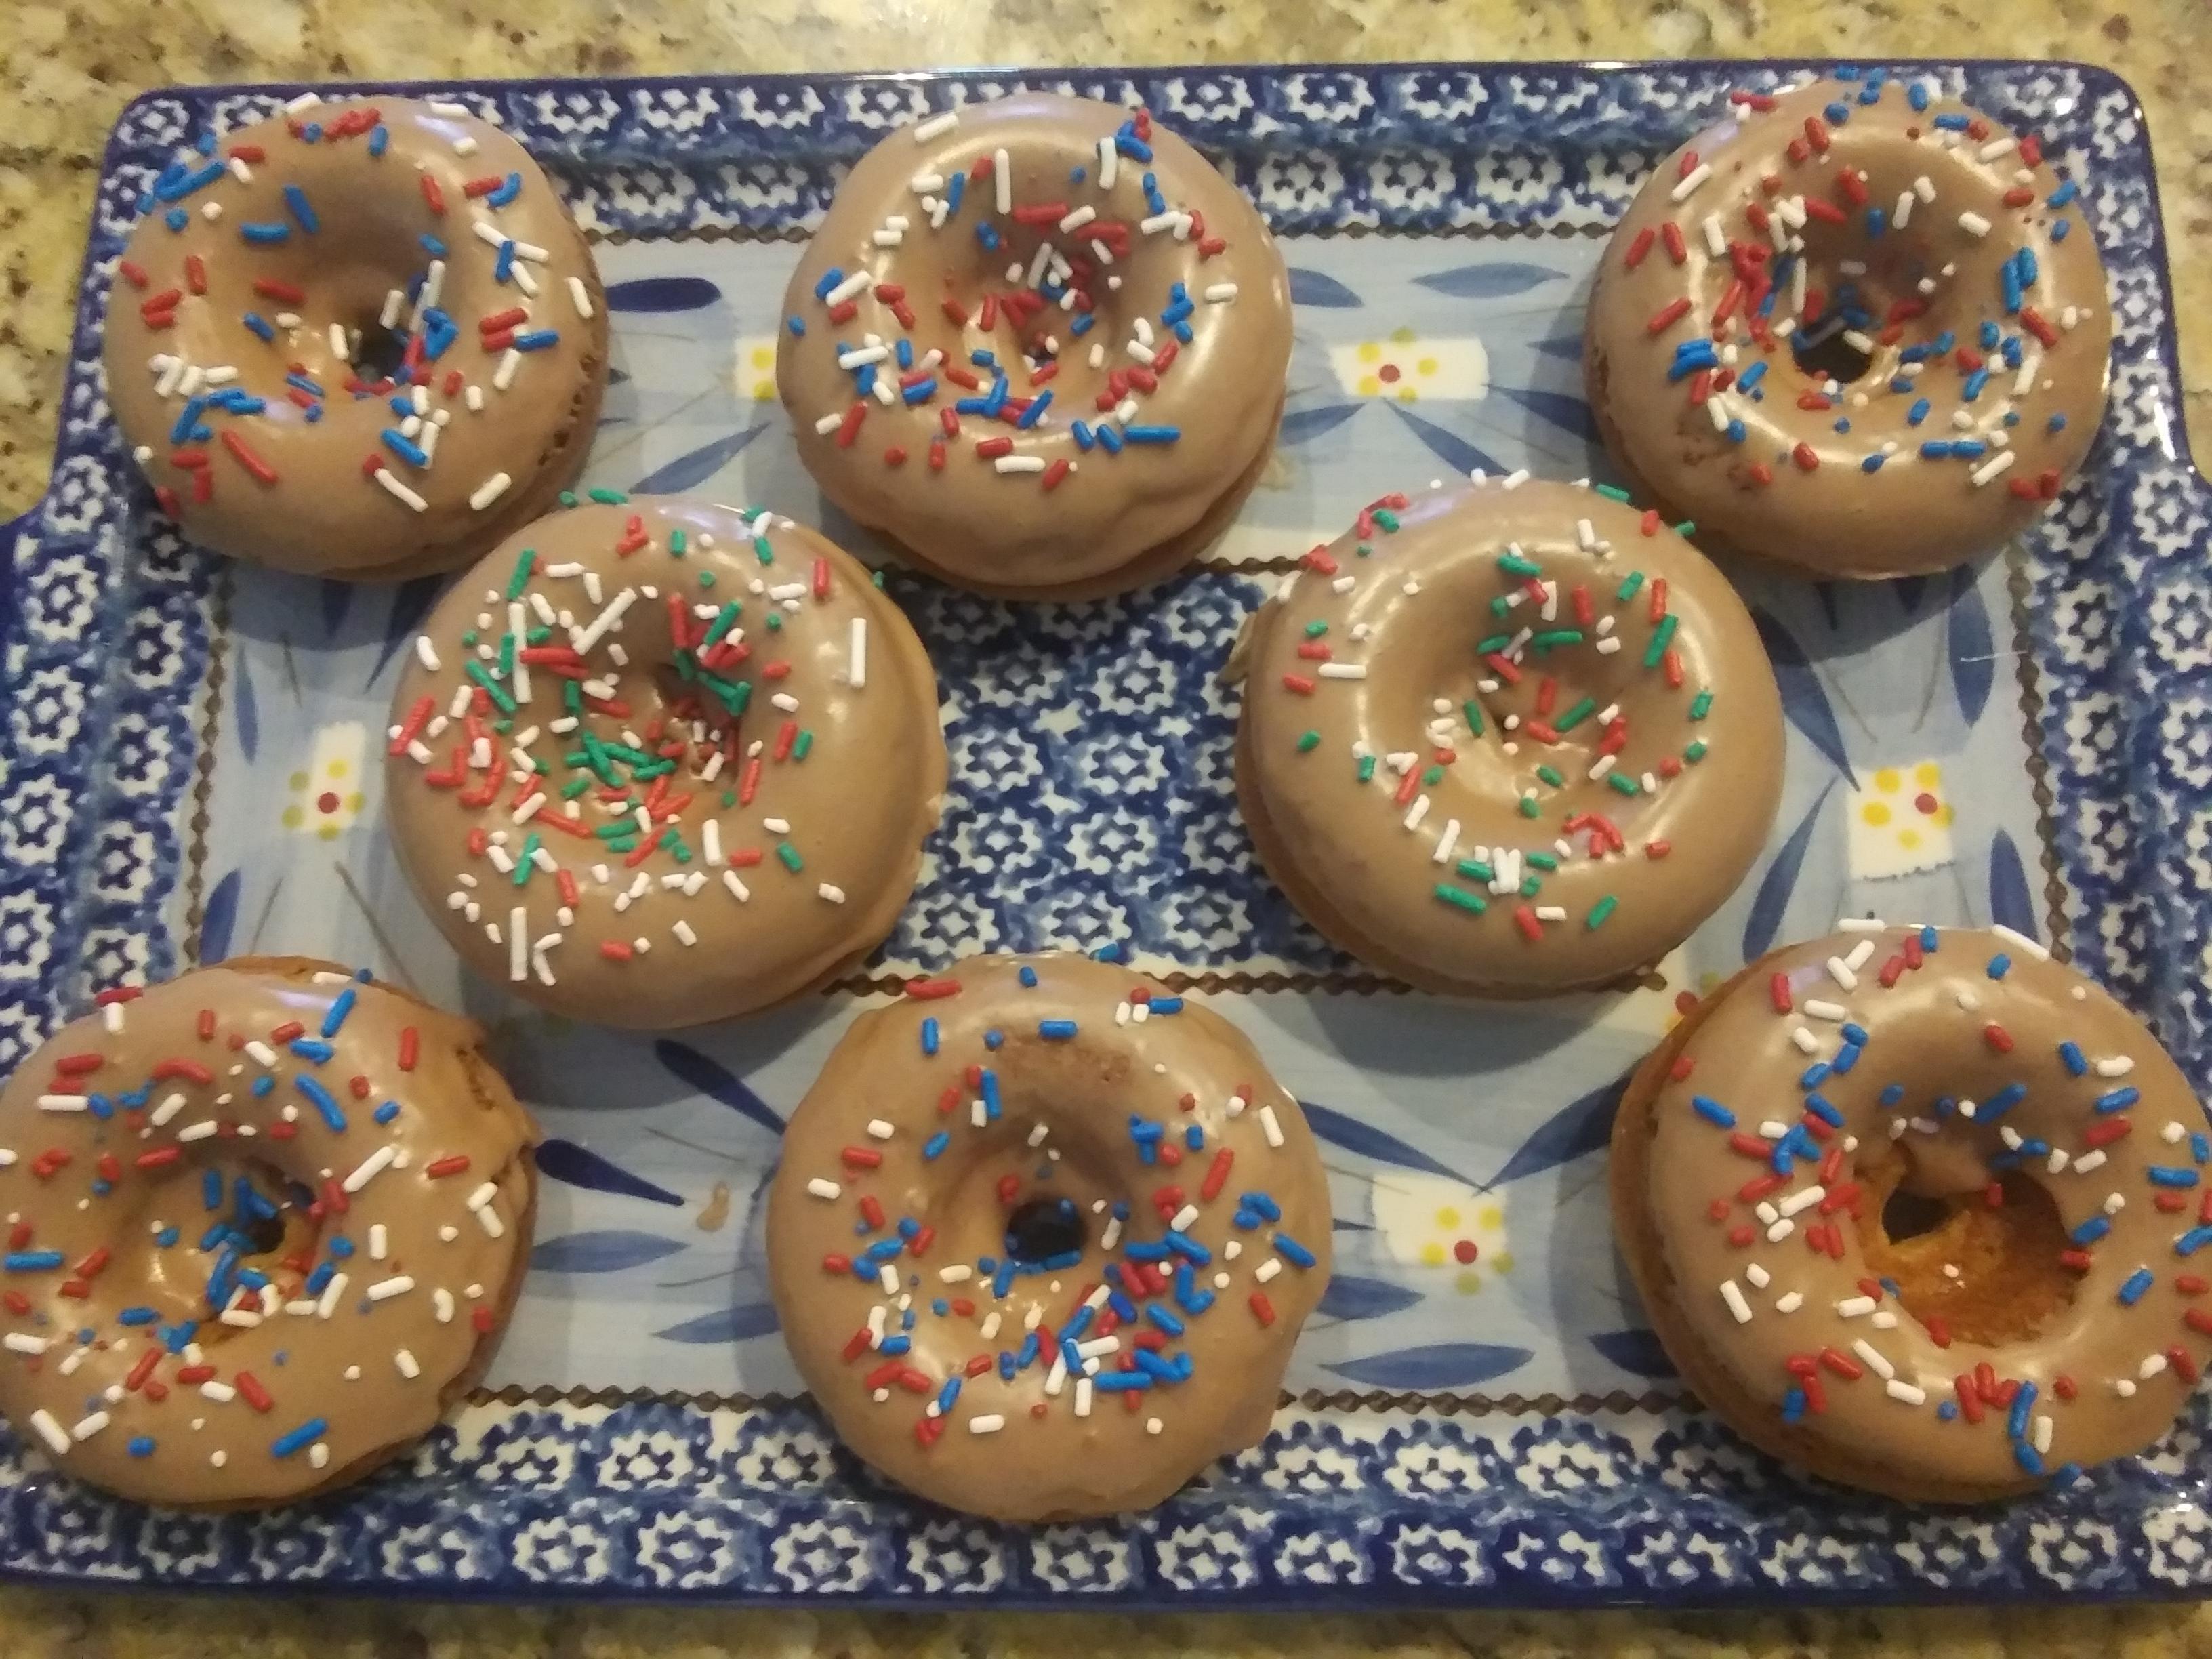 Baked Doughnuts